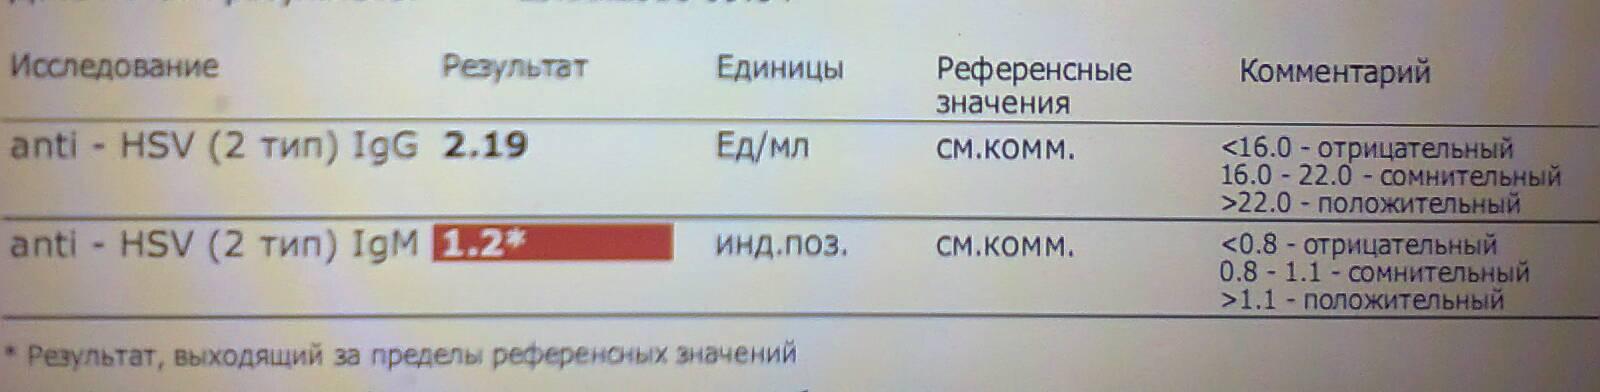 Hsv 2 at igm анализ крови 1 норма анализ у гормоны на тестостерон